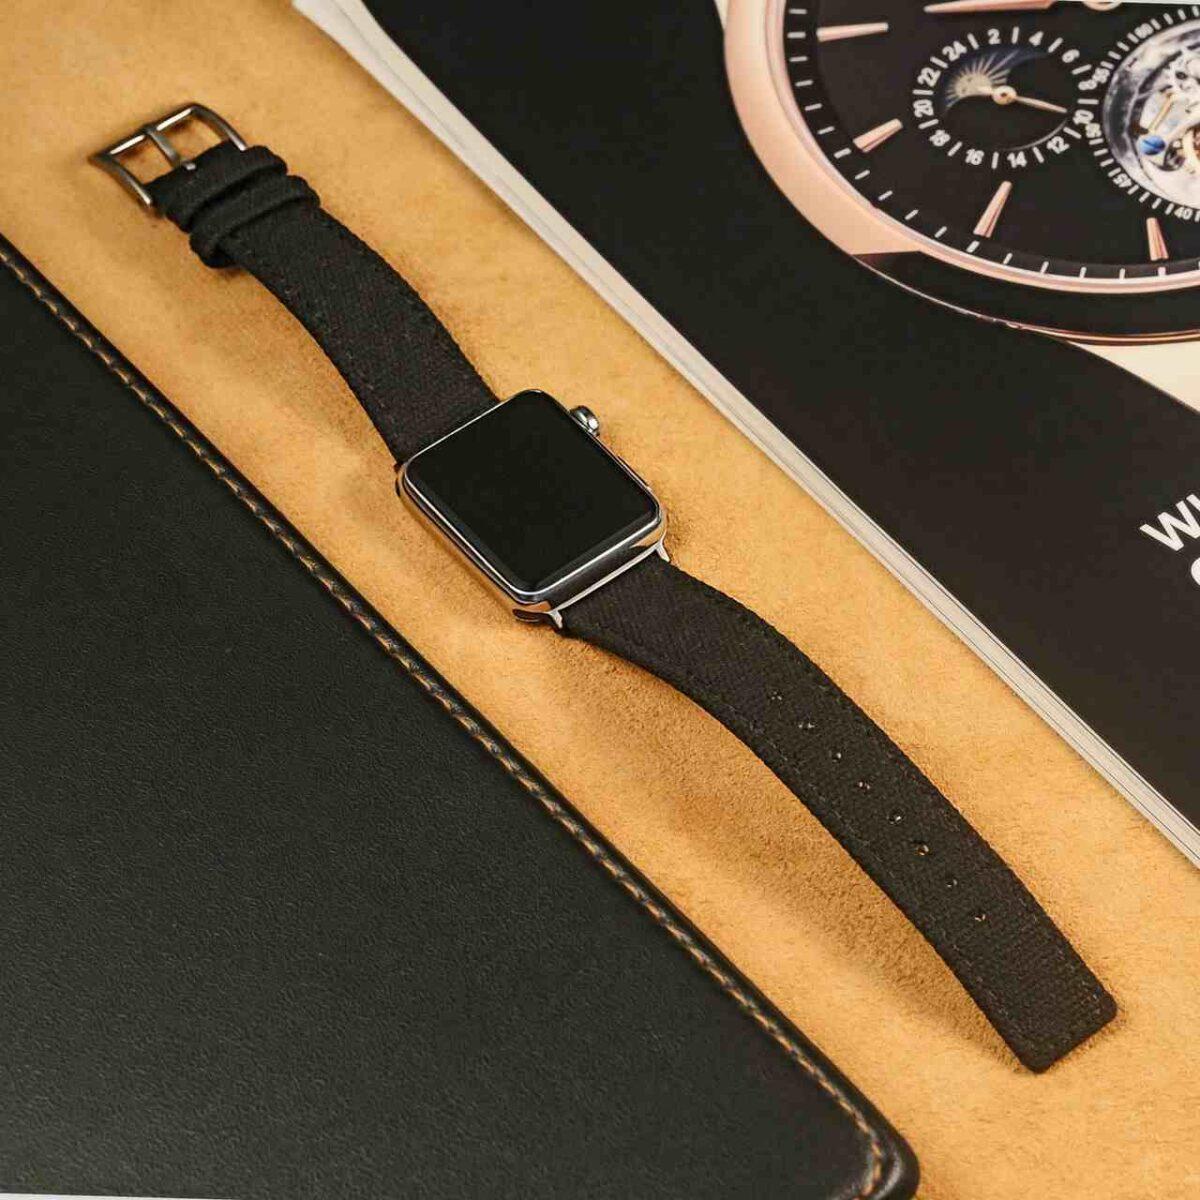 Apple Watch Bands   Black Weaved Canvas   Hemsut